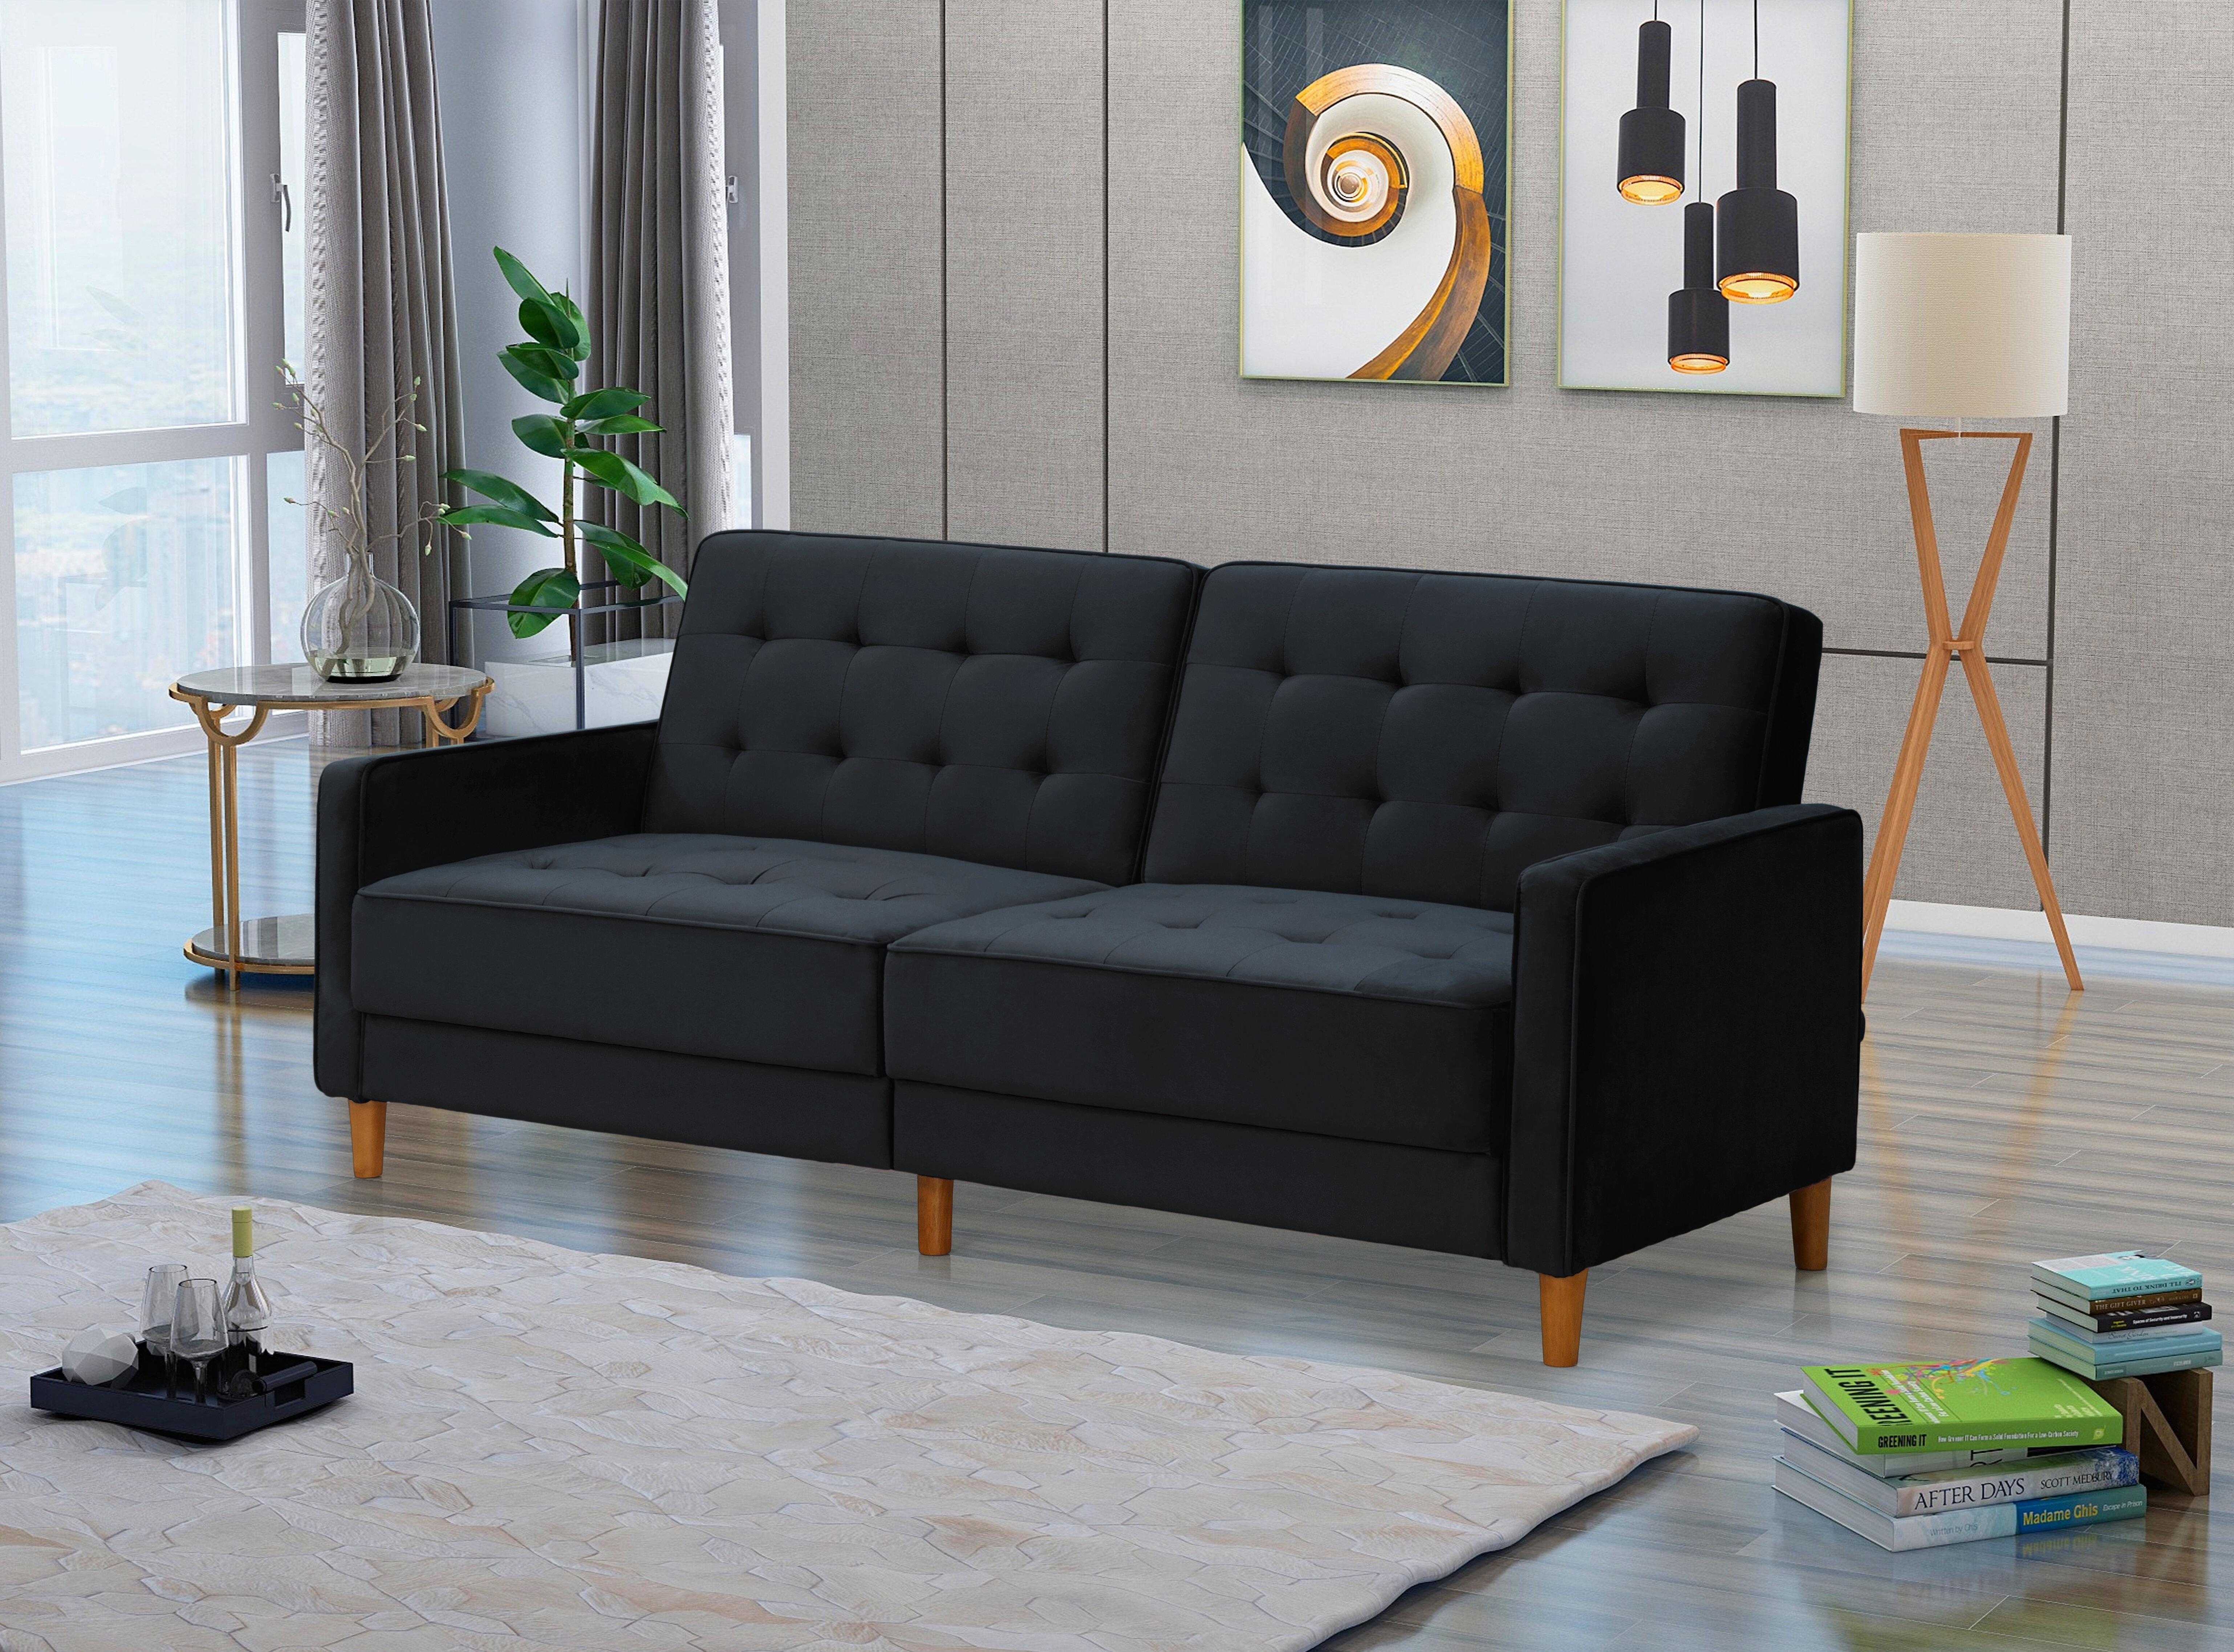 Corrigan Studio Square Arms Modern Velvet Upholstered Sofa Bed Blue 78 Lx31 9 Wx32 7 H Wayfair Ca